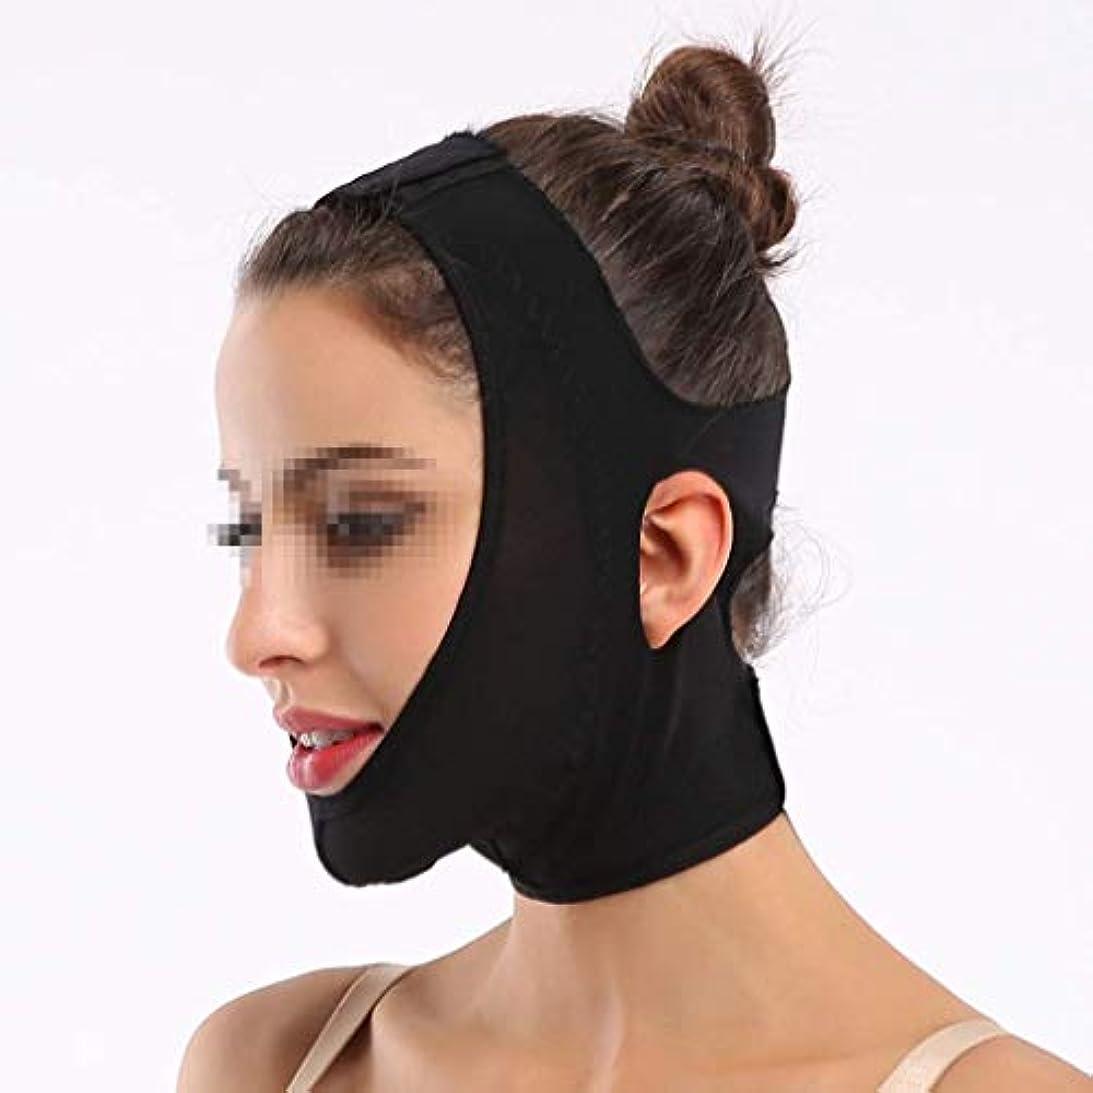 Vフェイスマスク、包帯マスクを持ち上げて引き締めるスキニービューティーサロン1日2時間Vフェイスマッサージ術後回復